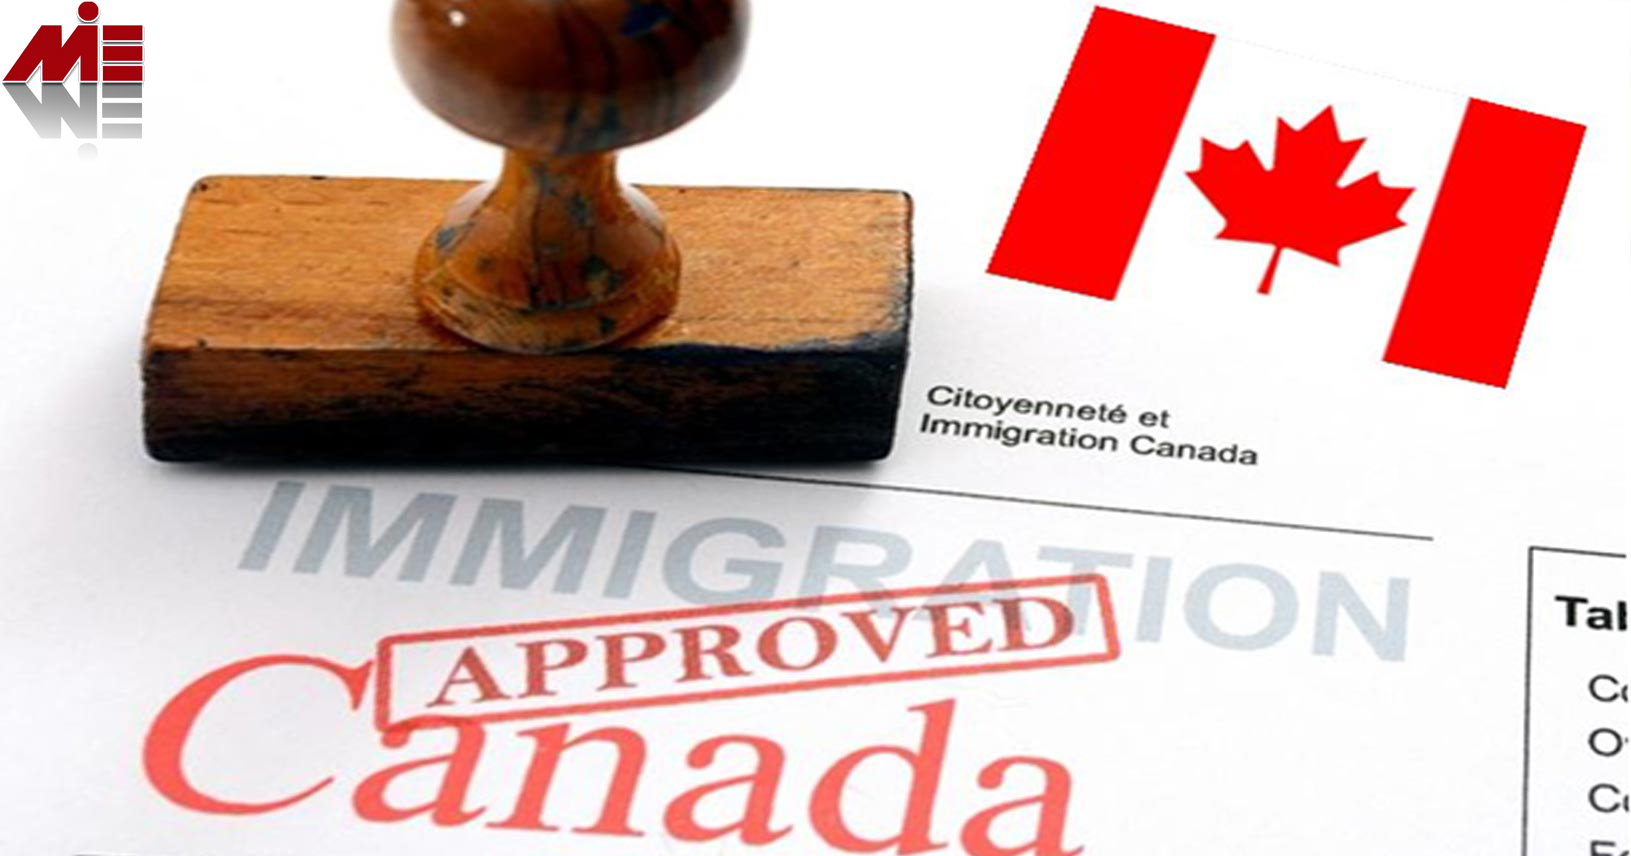 ویزای کانادا وکیل مهاجرت در کانادا